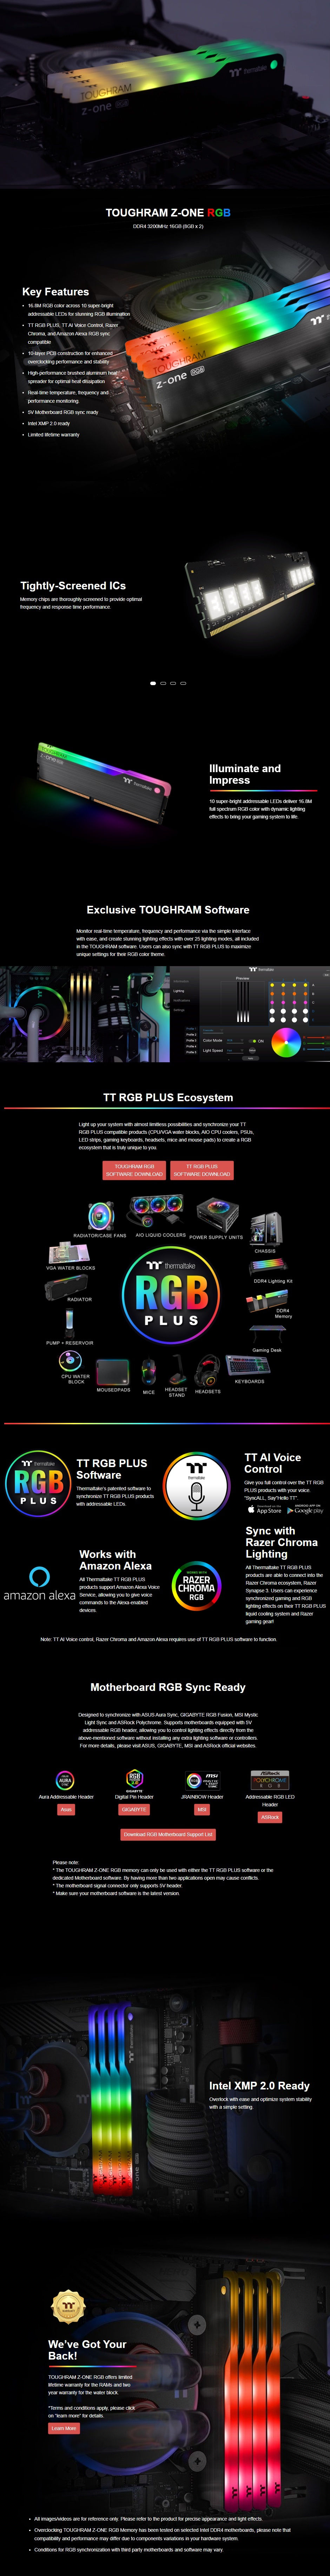 Thermaltake ToughRam Z-ONE RGB 16GB (2 x 8GB) DDR4 3200MHz CL16 Memory